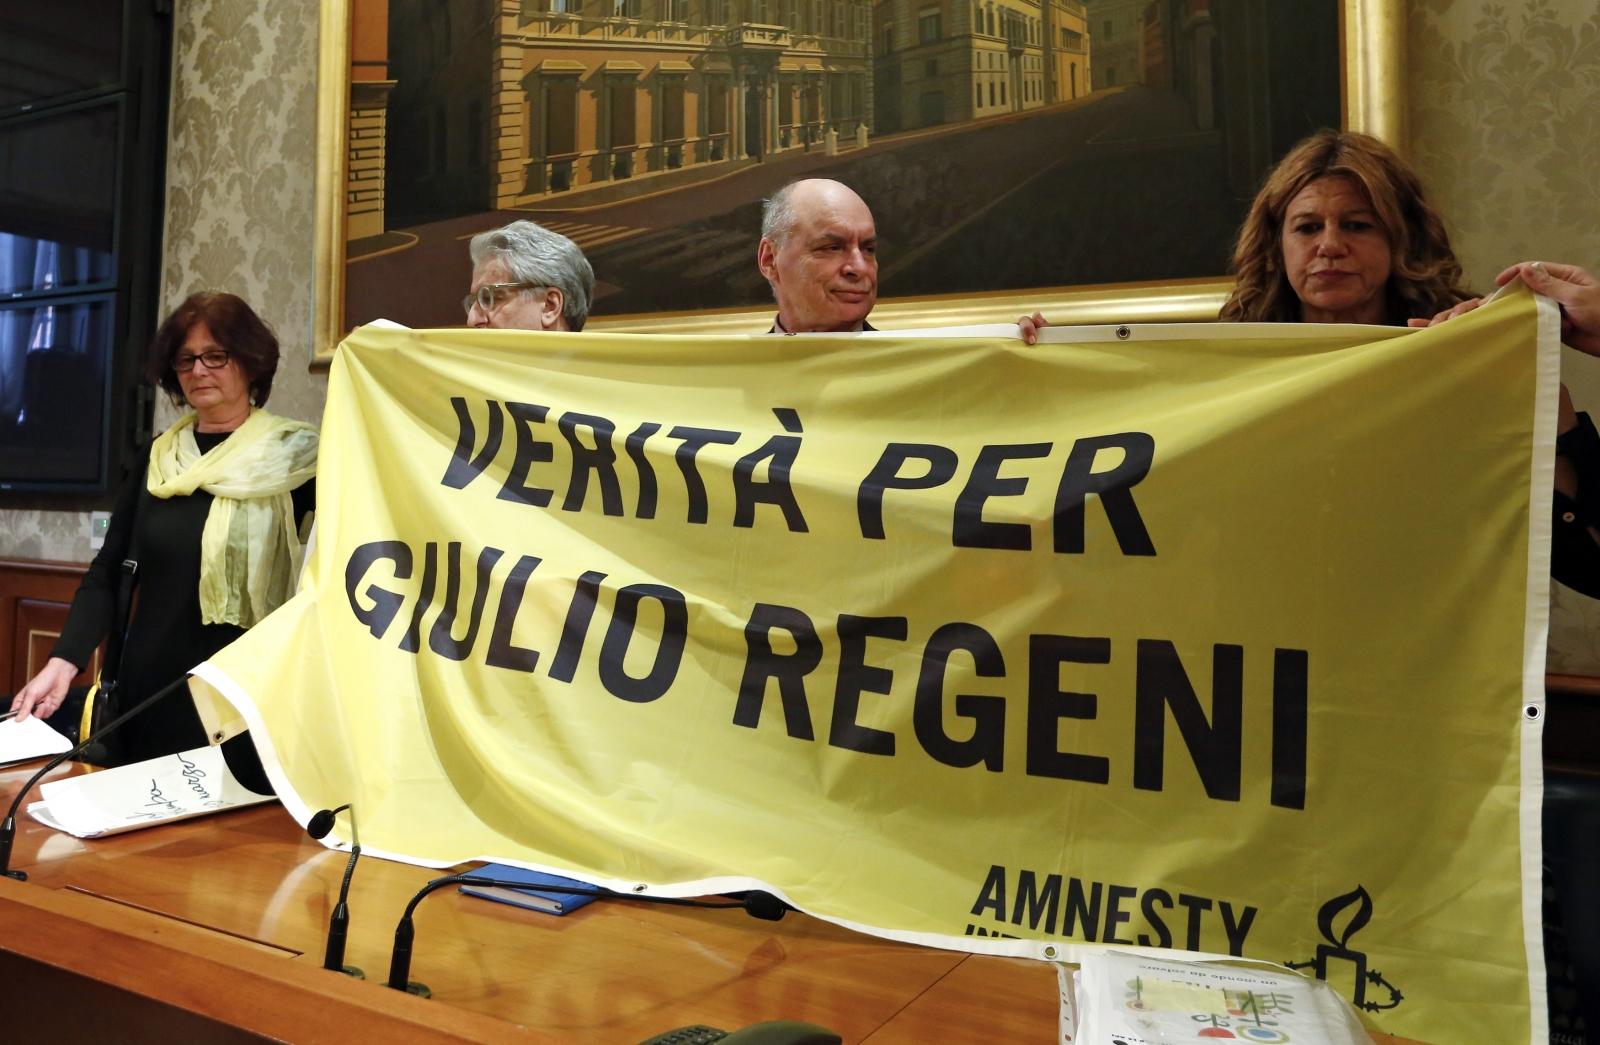 Giulio Regeni murder